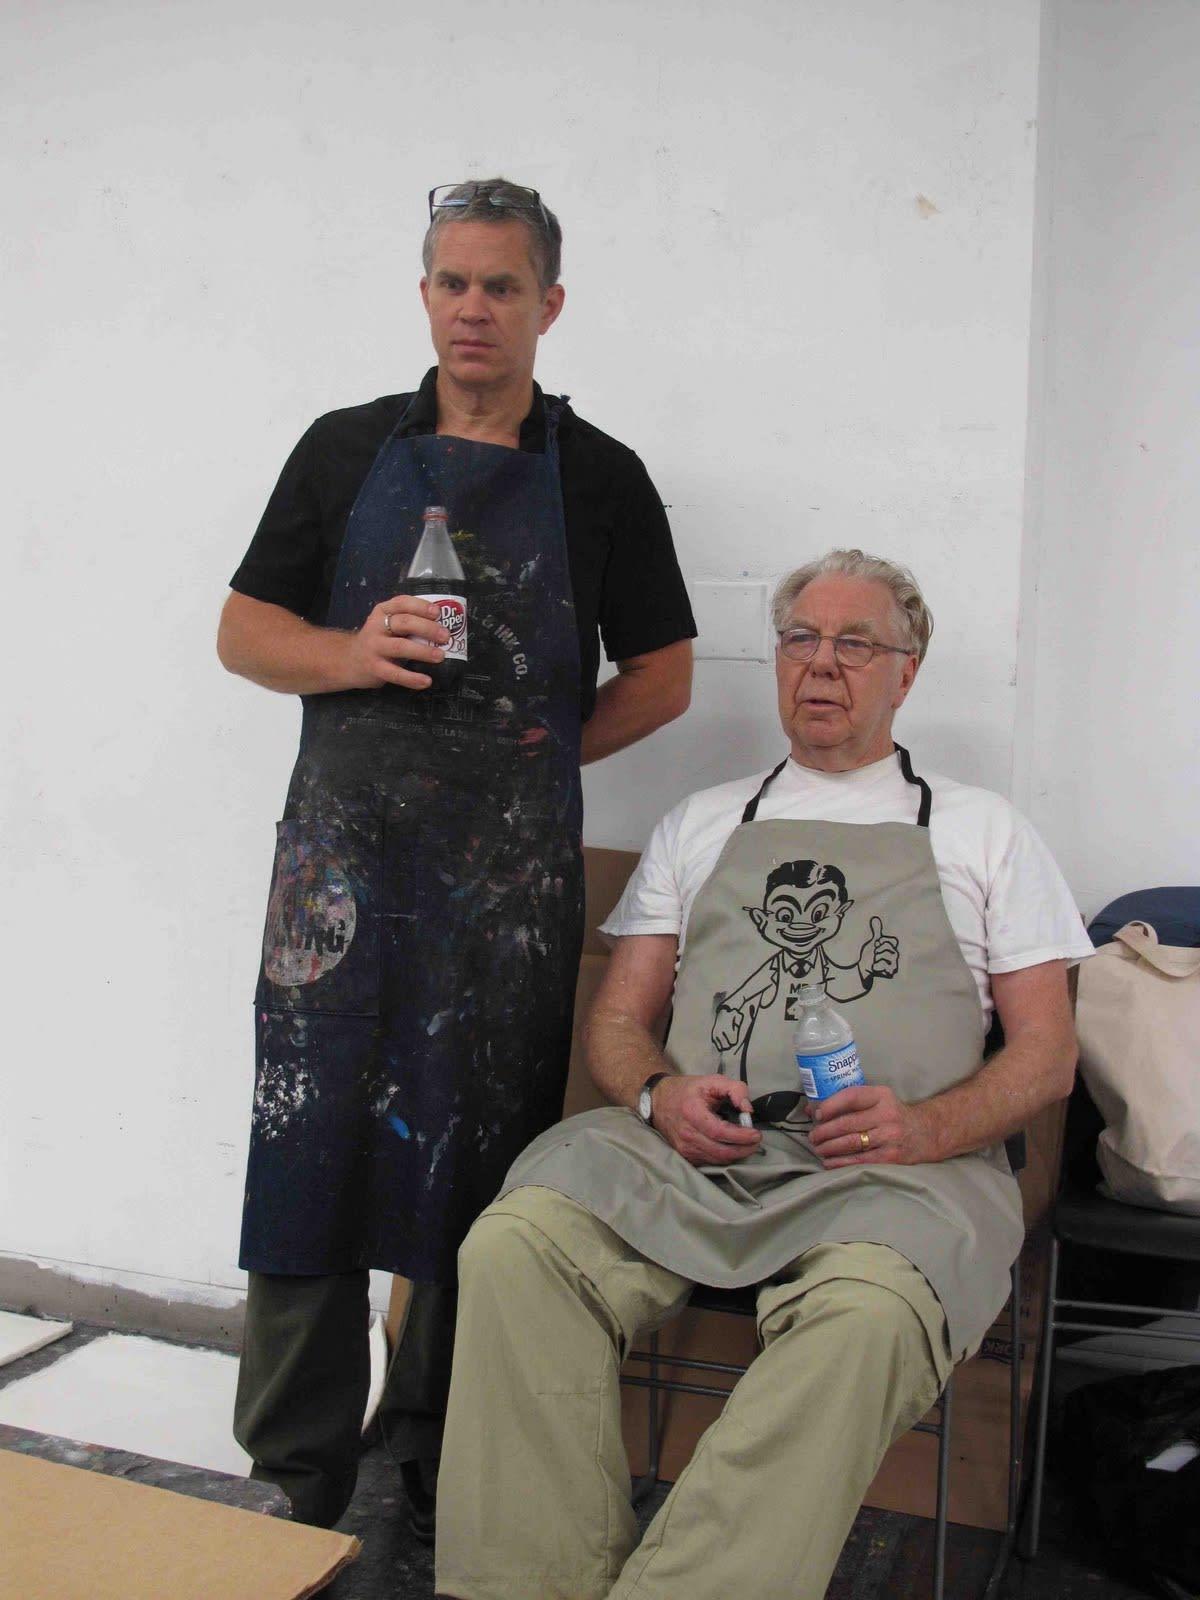 Max Gimblett Leads a Sumi Ink Workshop at New York School of Visual Arts